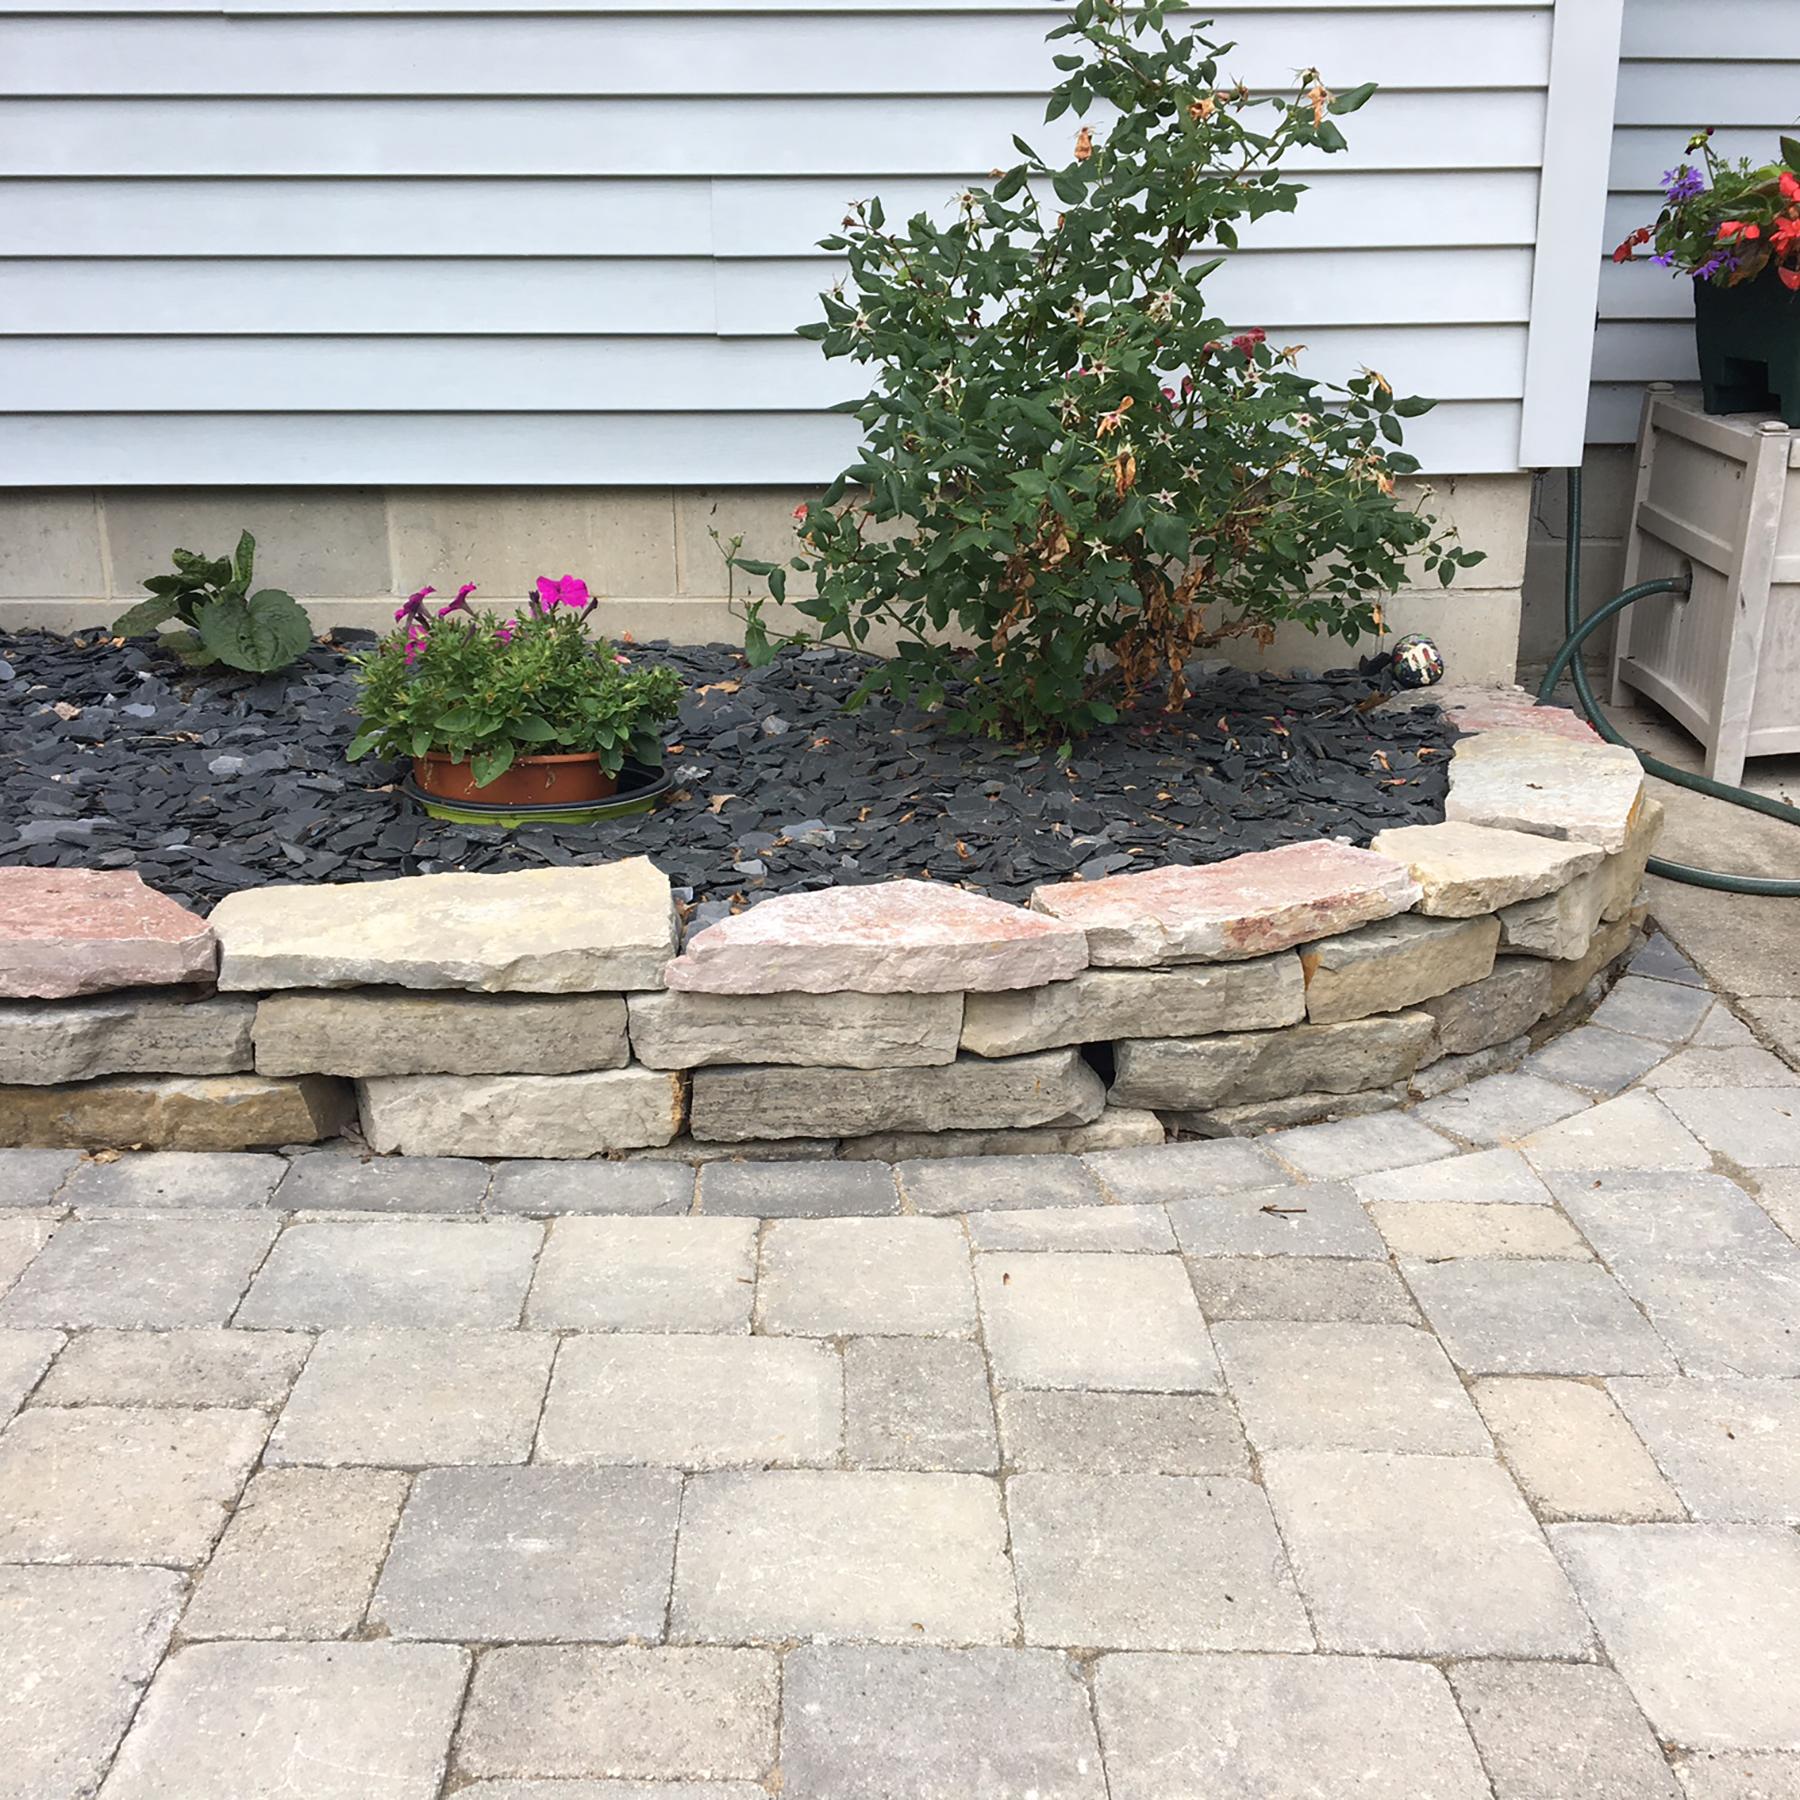 Brick pavers with natural stone retaining wall